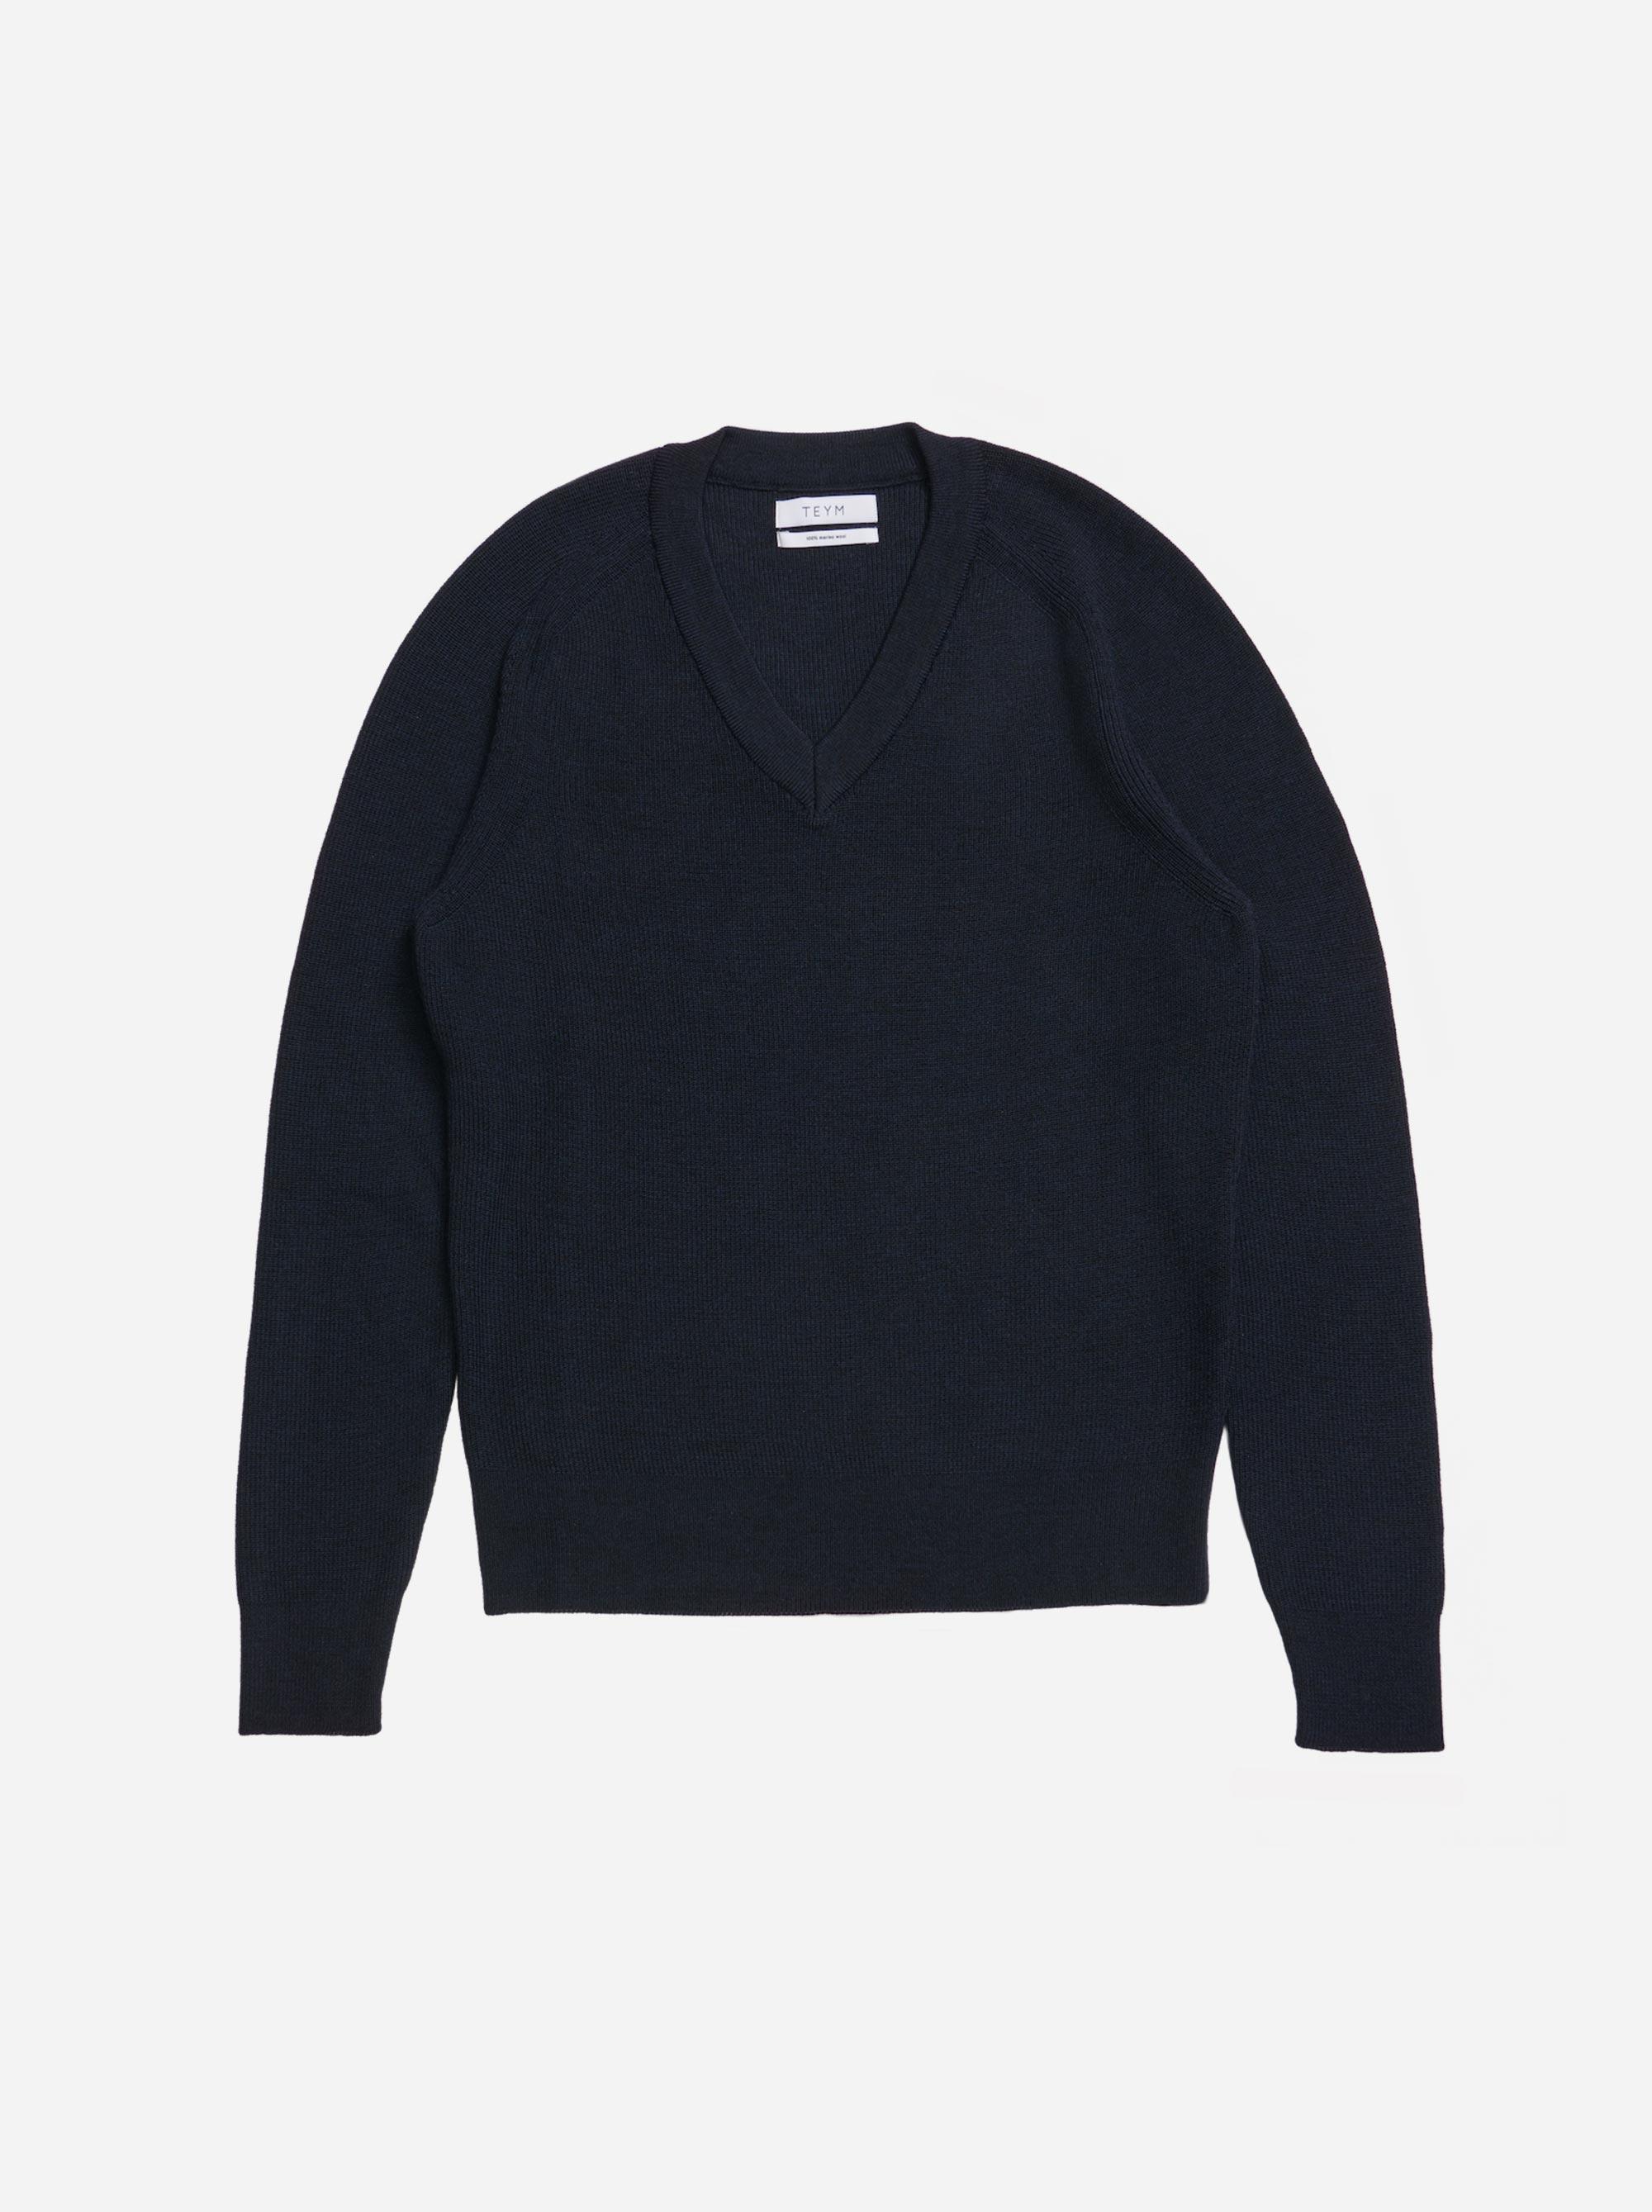 Teym - V-Neck - The Merino Sweater - Women - Blue - 4